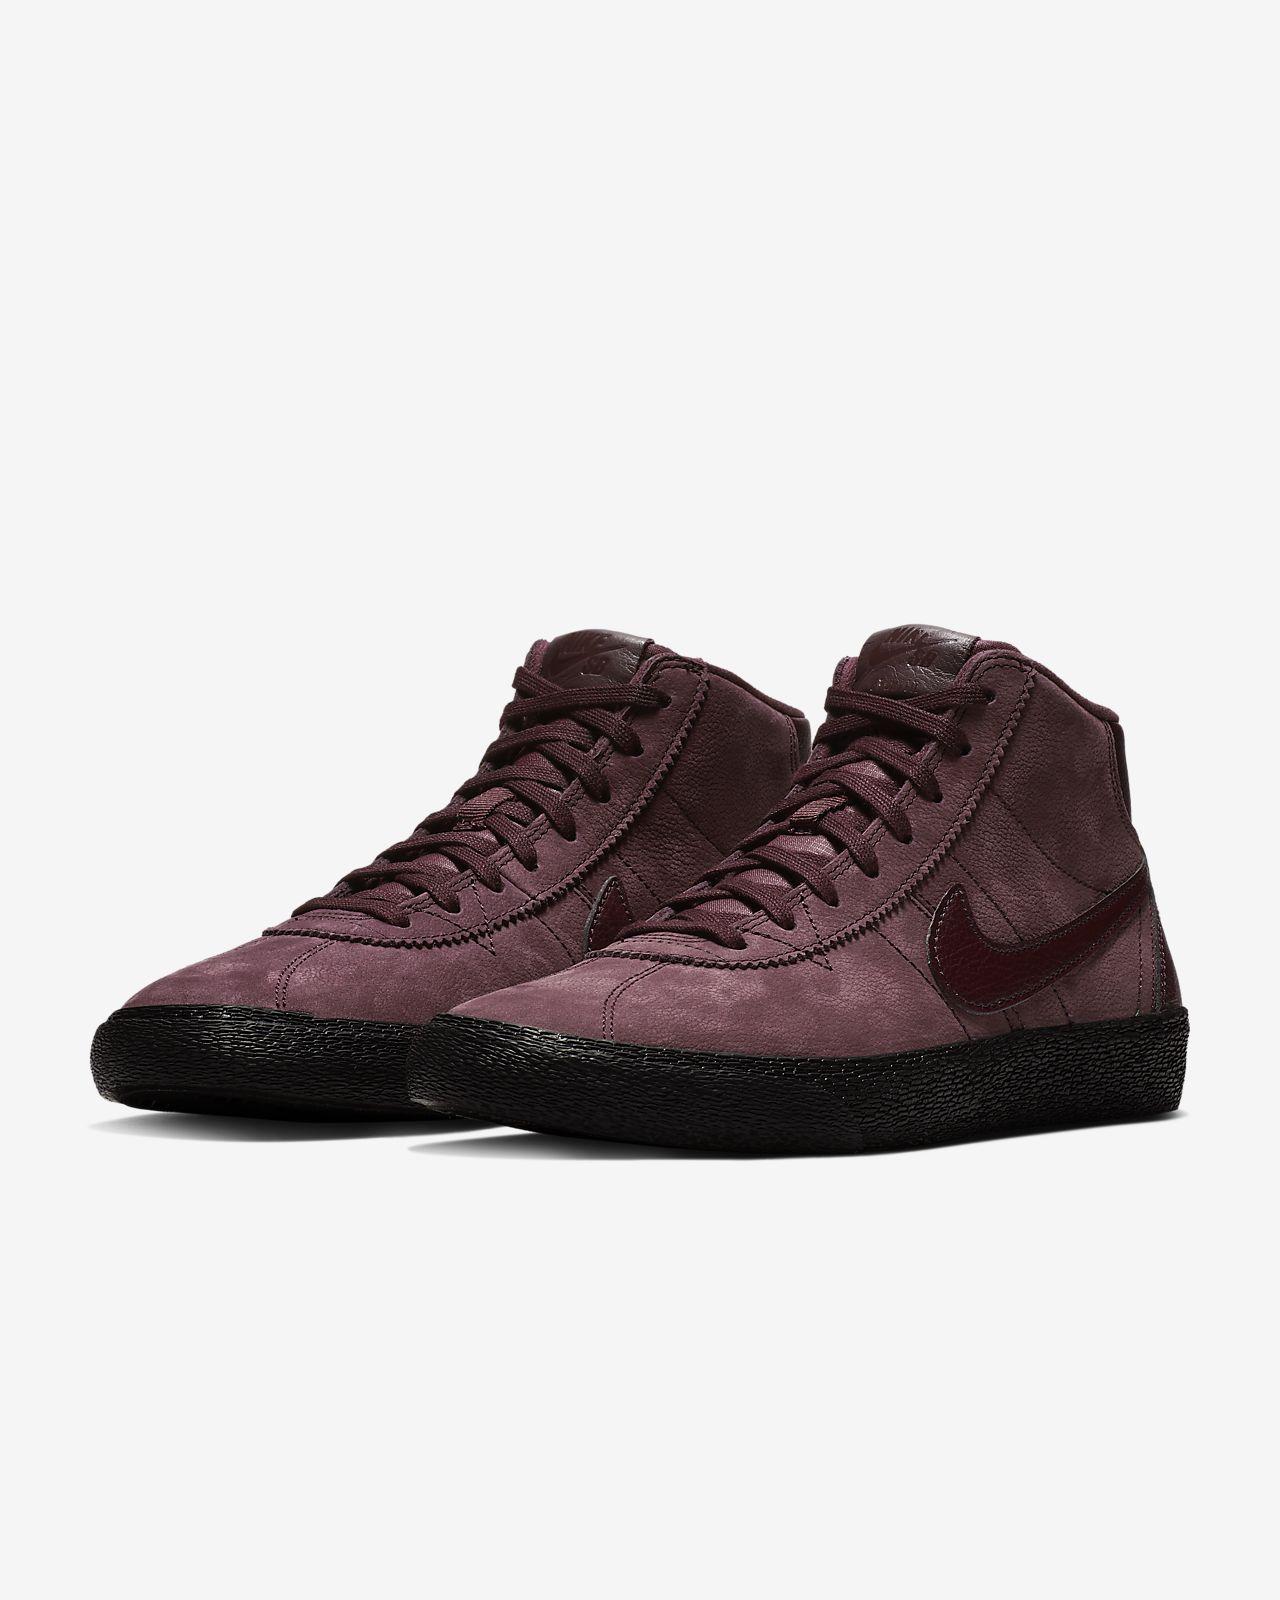 watch 95aef ab007 ... Nike SB Bruin High Premium Women s Skateboarding Shoe